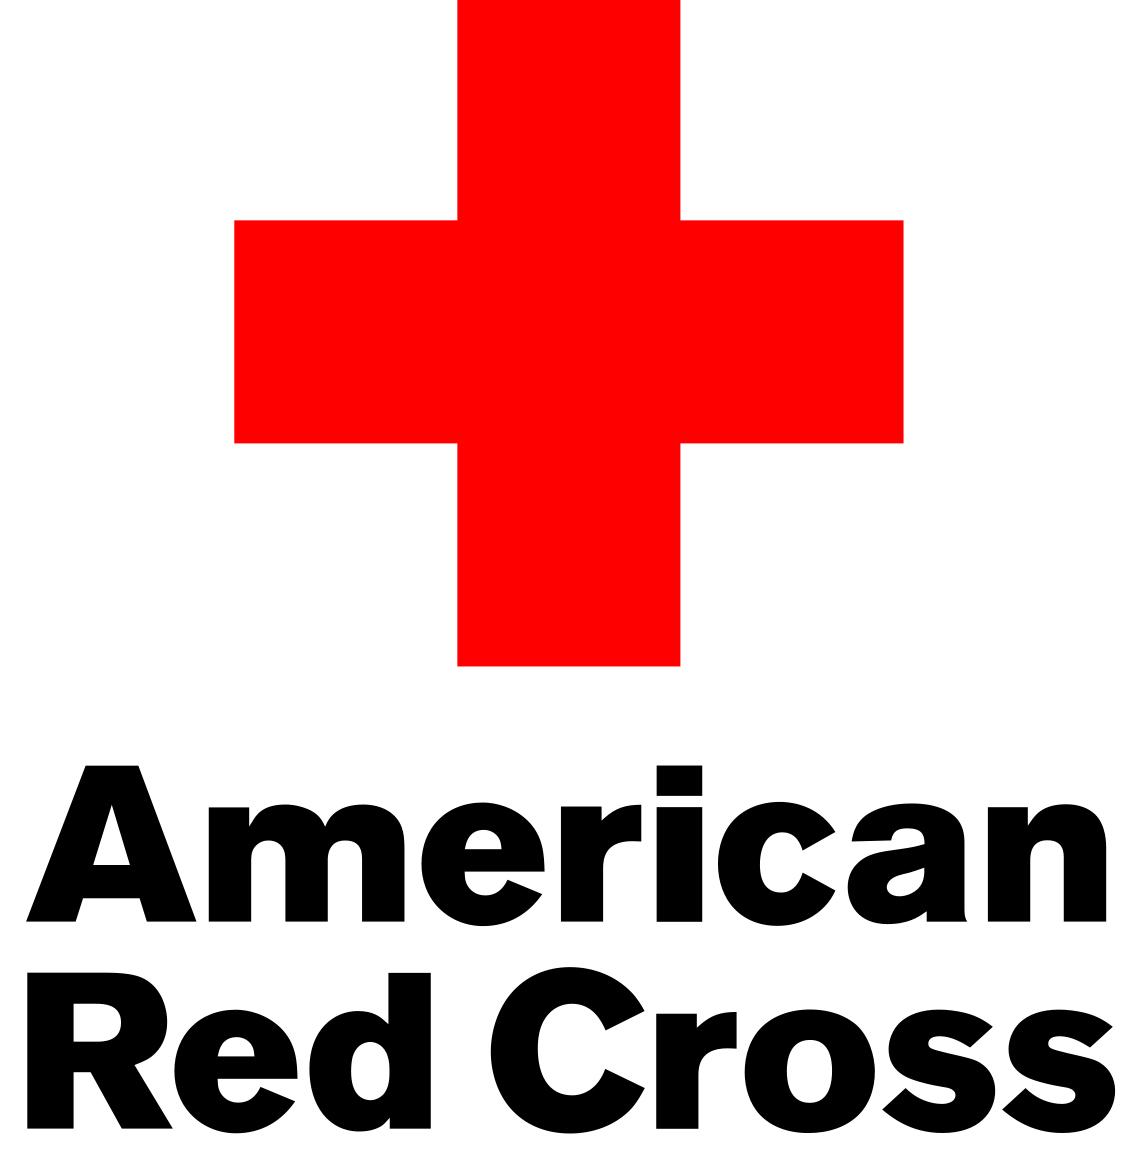 American Red Cross Logo PNG - 30595